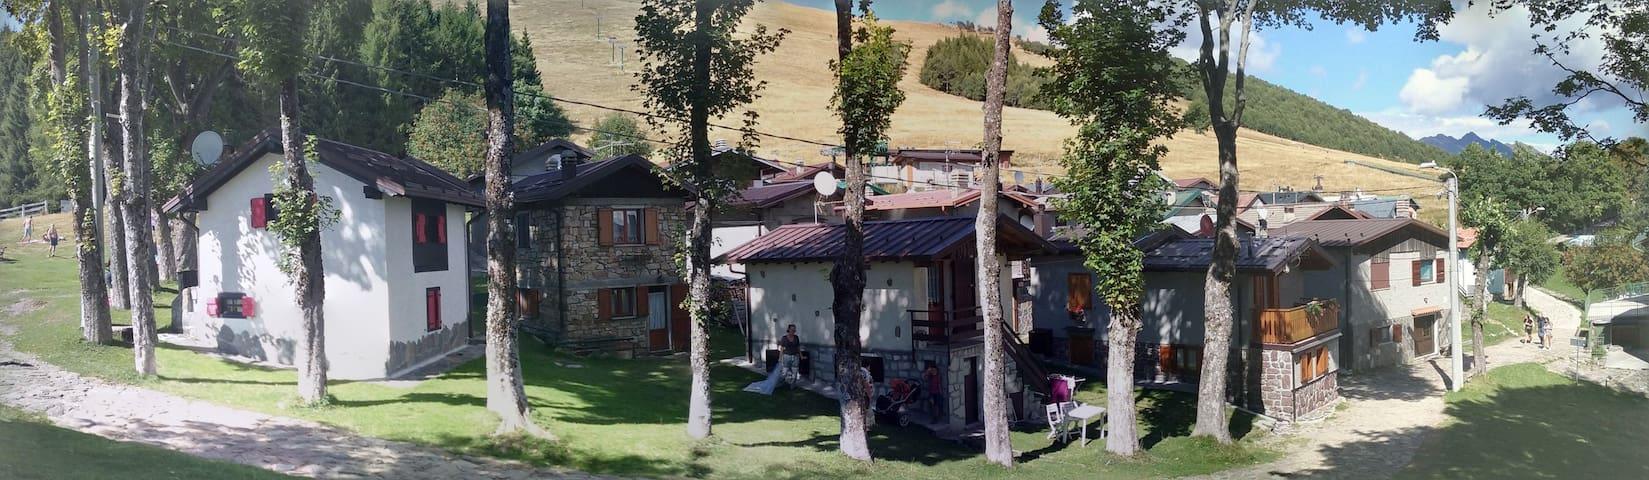 baita in paradiso incontaminato - Giumello - Alpehytte